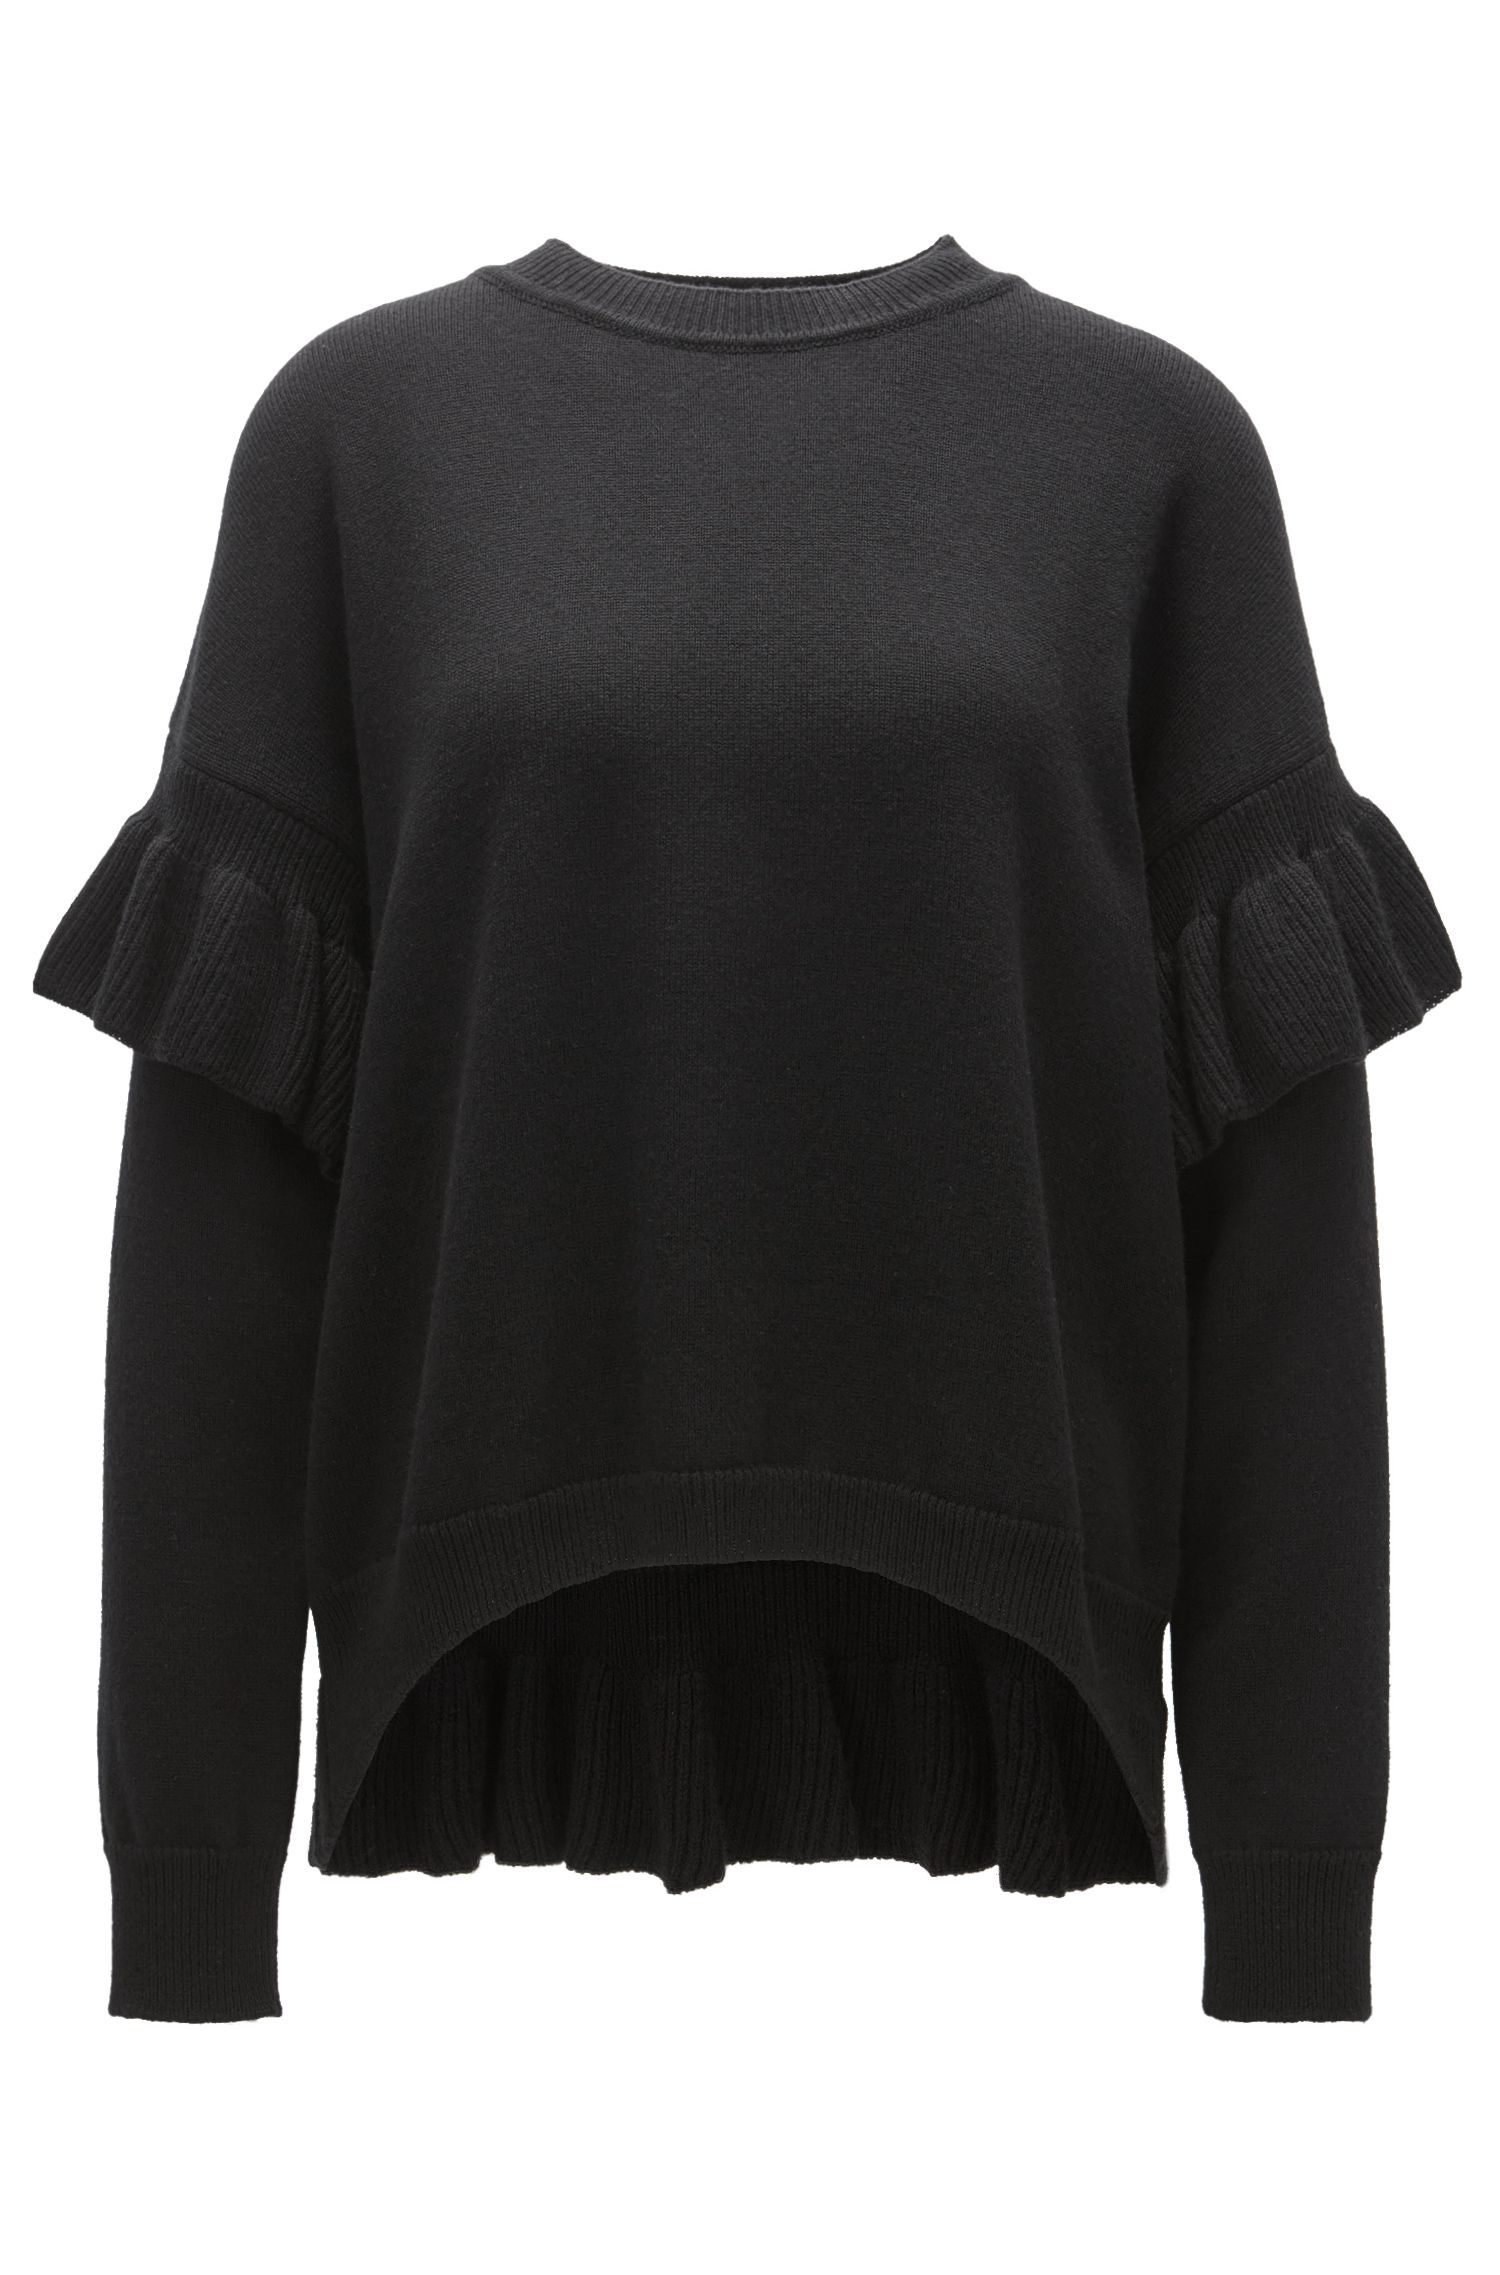 Wool Silk Cashmere Sweater | Francisca